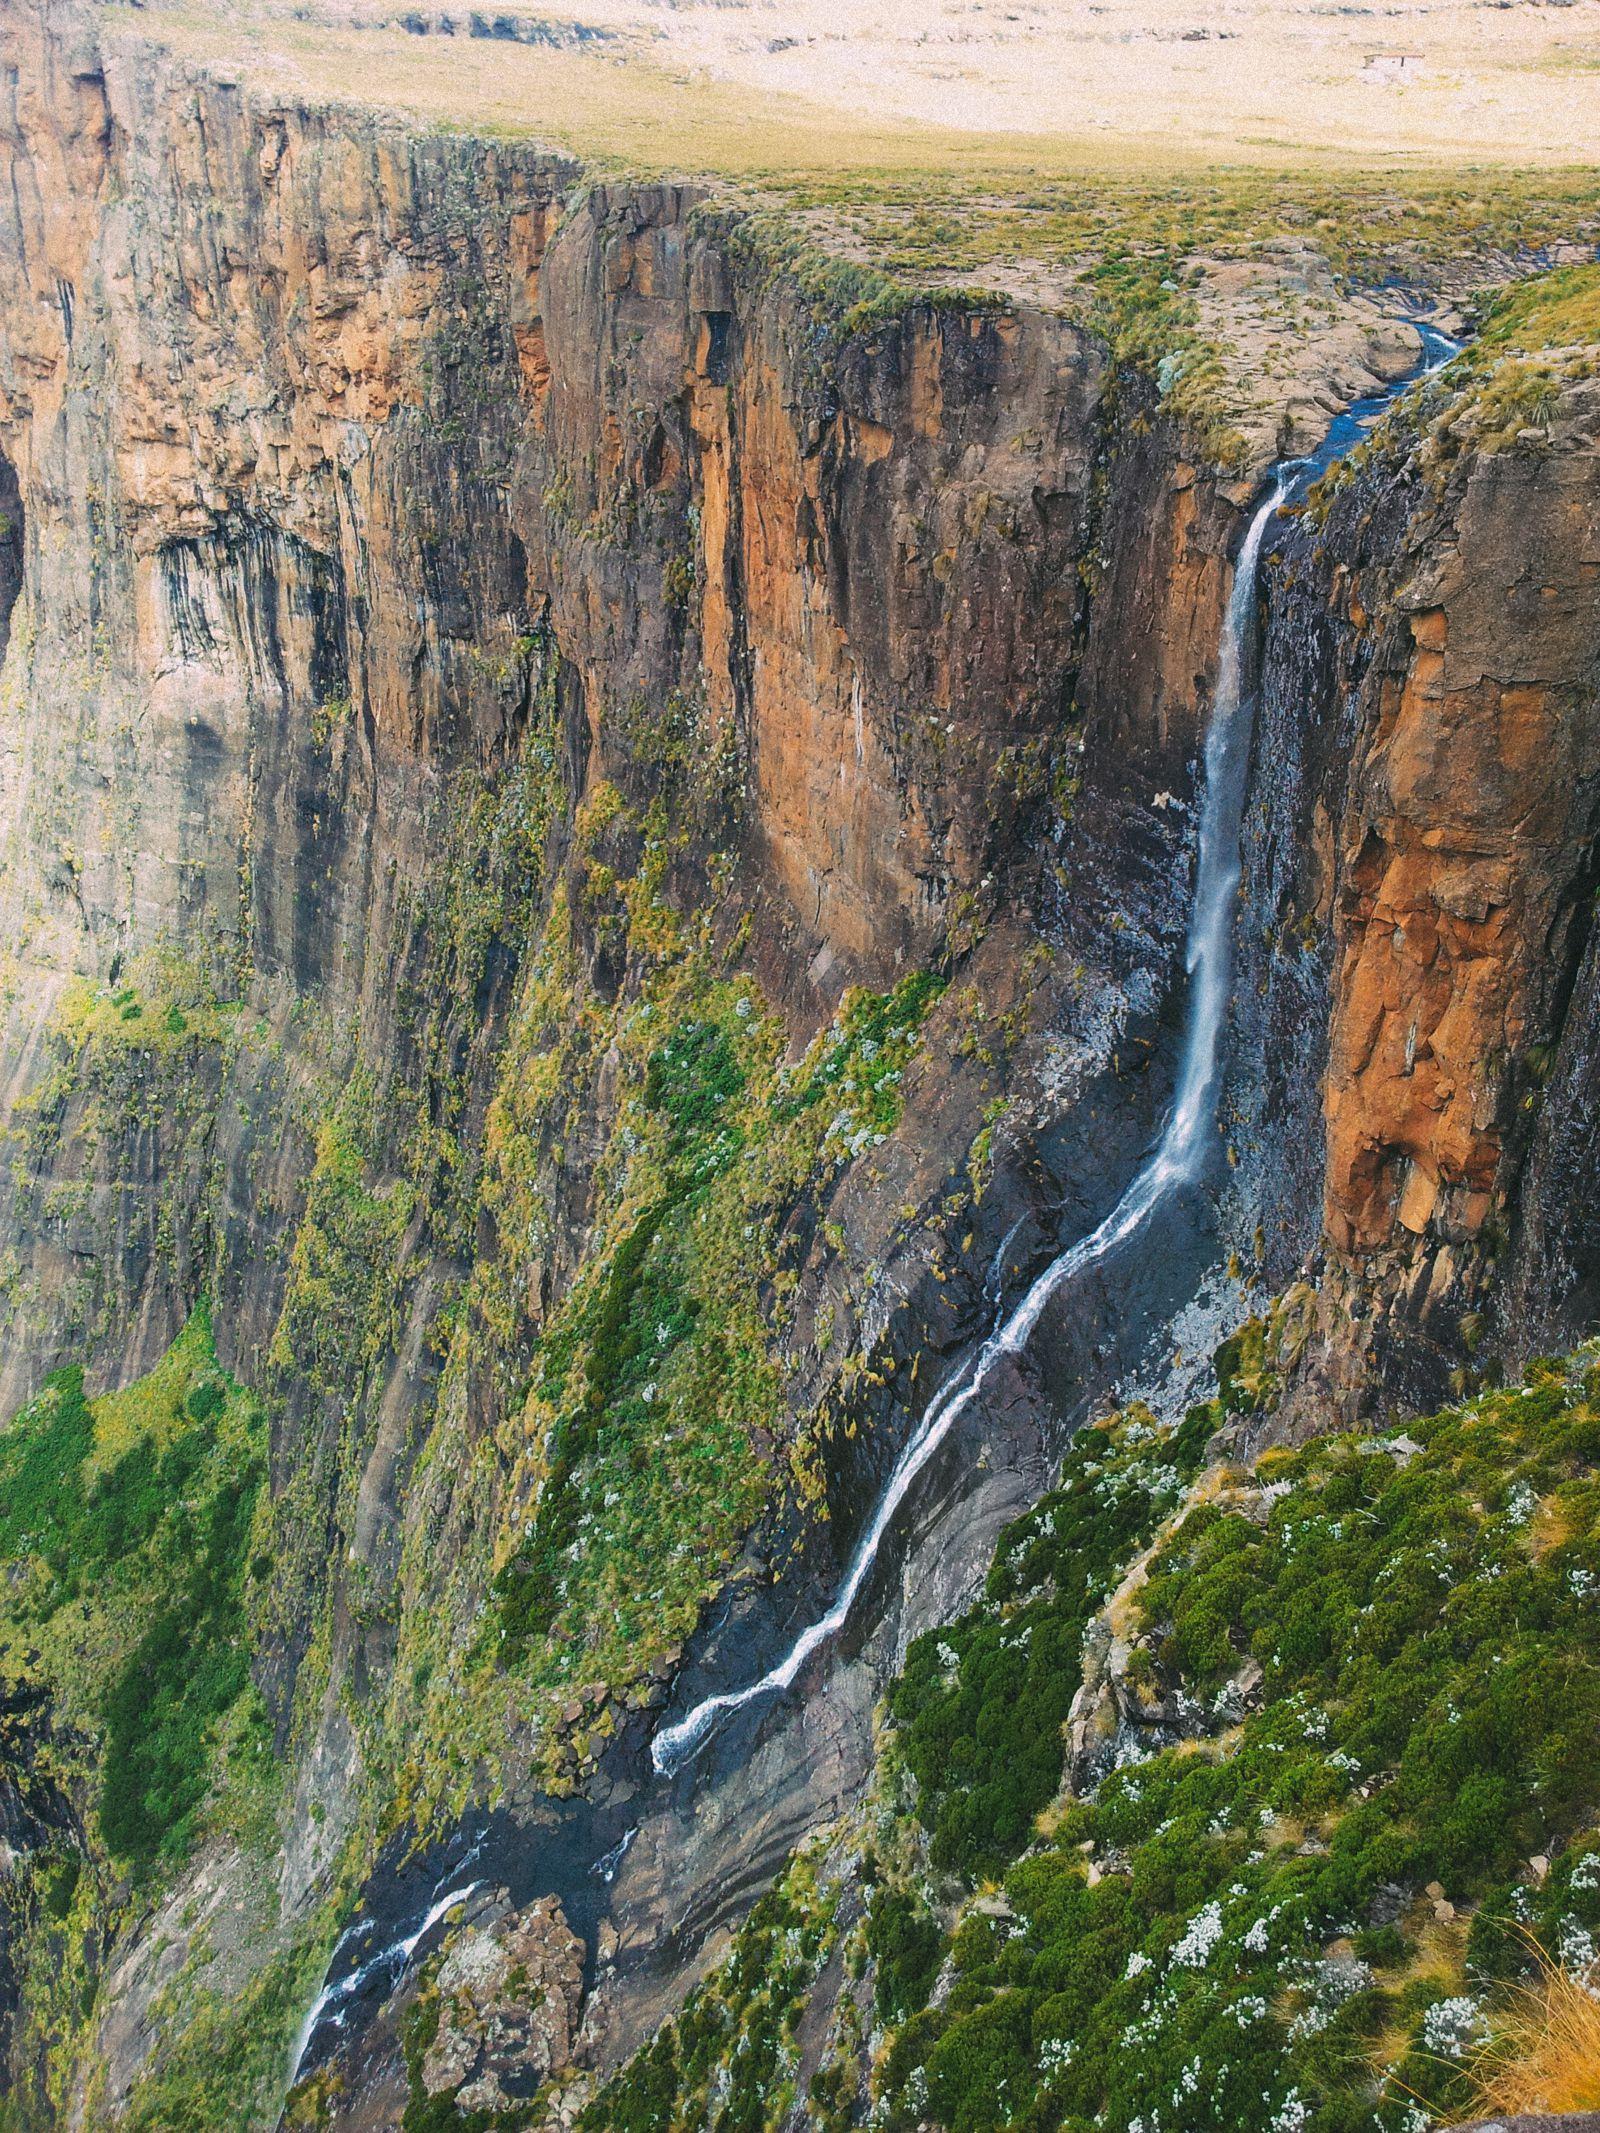 10 Amazing Waterfalls Around The World You Need To See! (4)